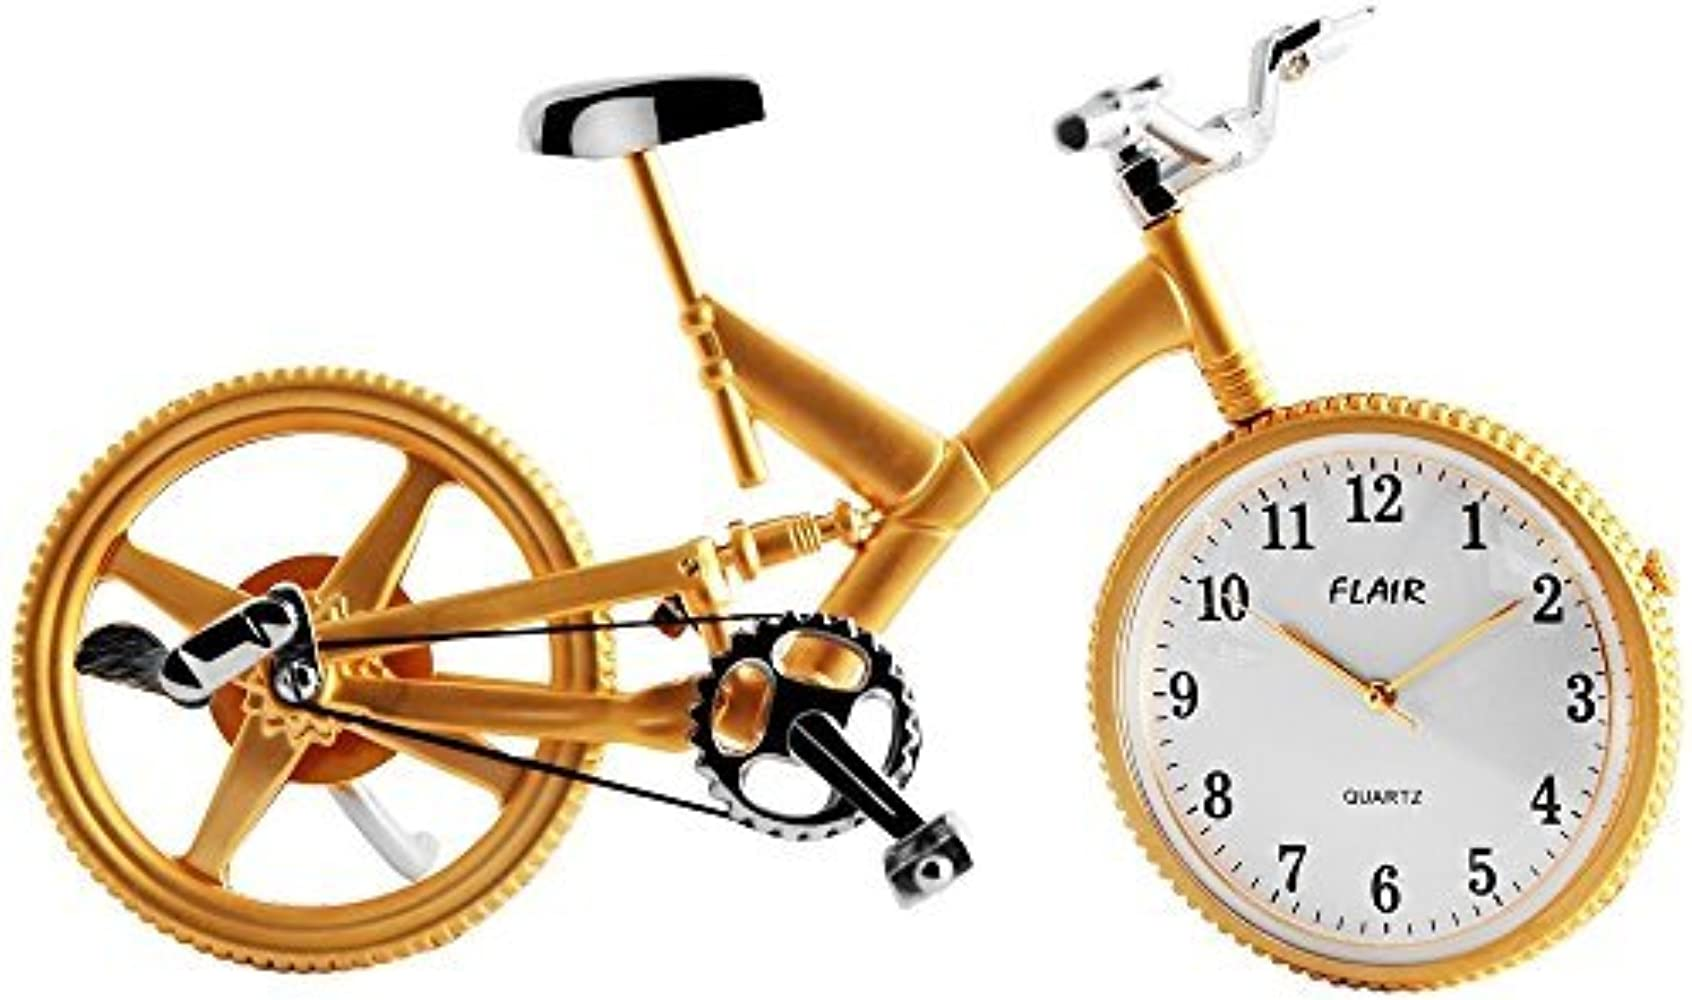 Reloj Miniatura, Reloj Miniatura - Mountain Bike - Bicicleta - Bicicleta: Amazon.es: Relojes